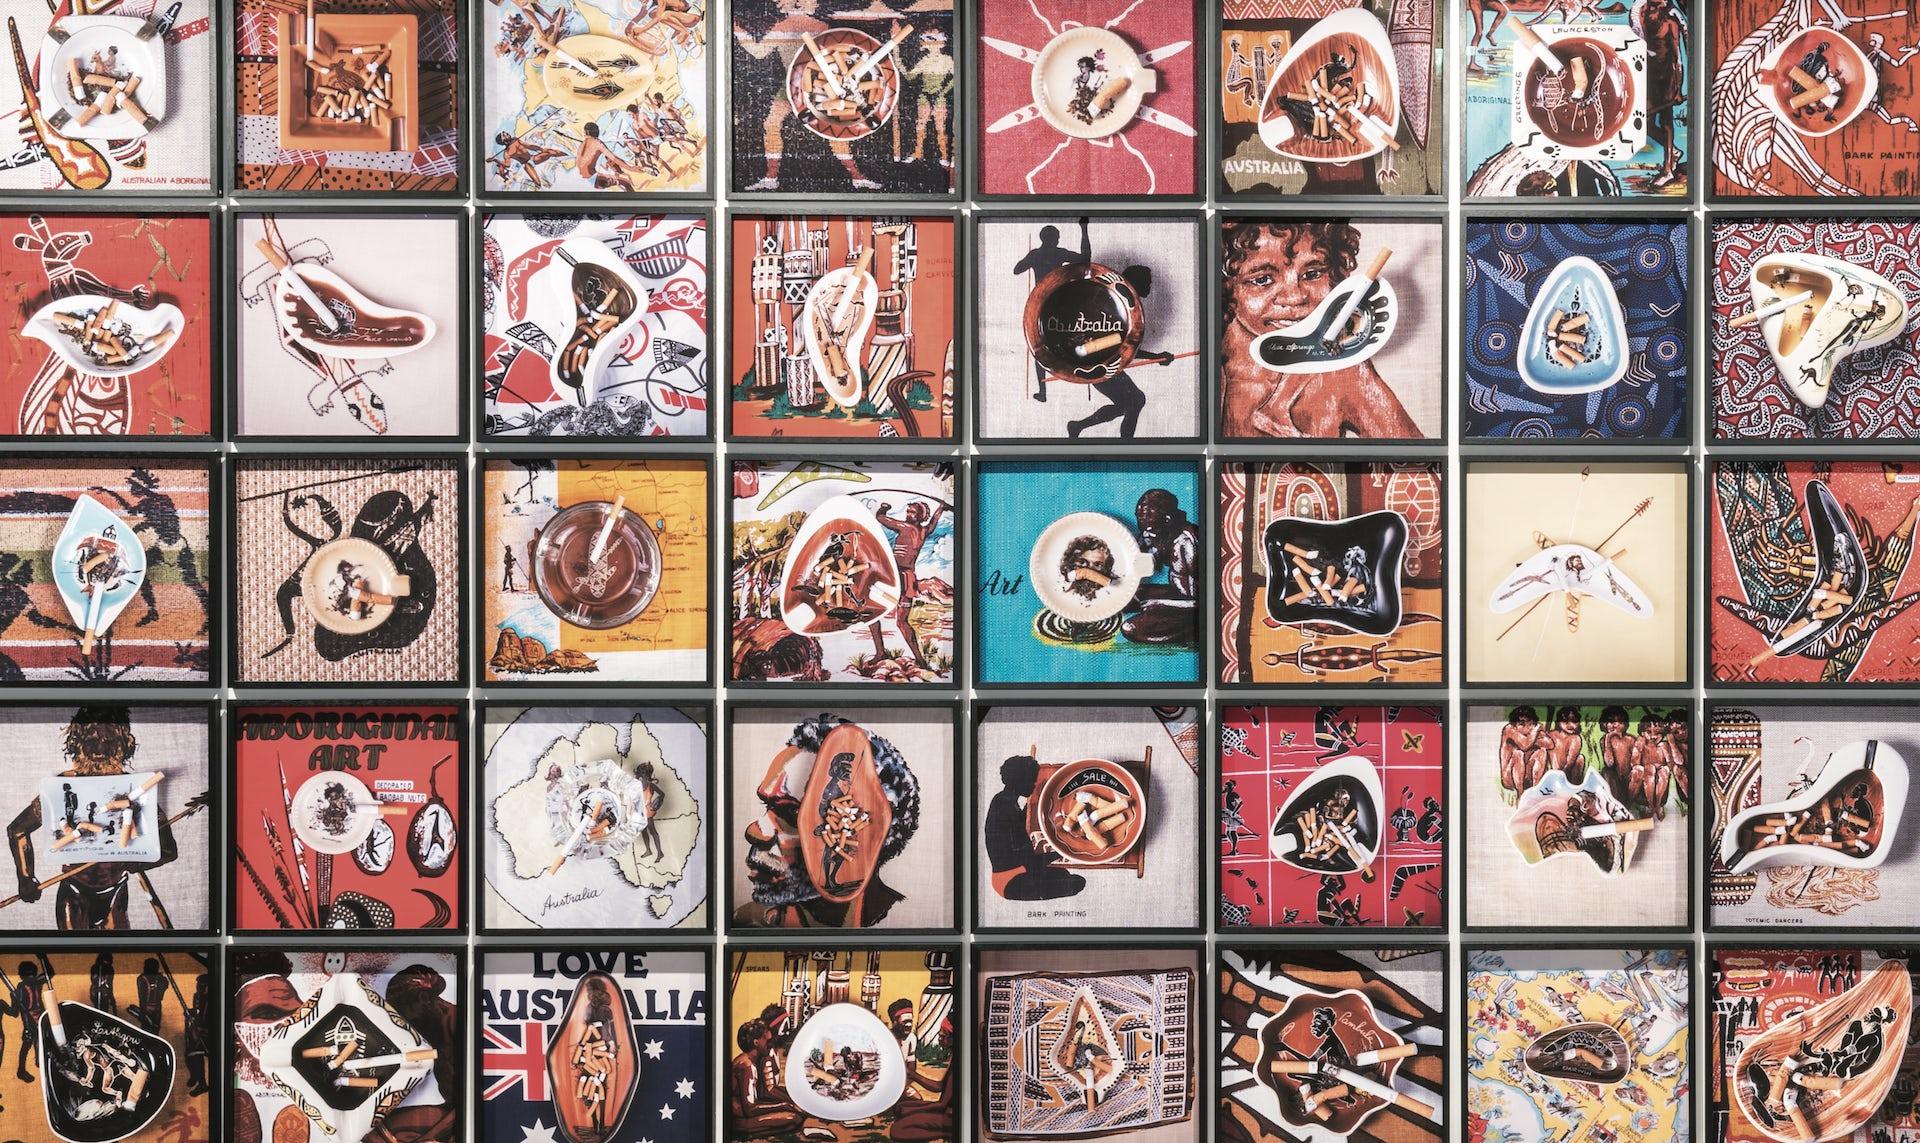 Tony Albert Girramay/Yidinji/Kuku Yalanji peoples. Australia Qld/NSW b.1981. Mid Century Modern (series) 2016. Pigment prints | 24 works: 100 x 100cm (each)